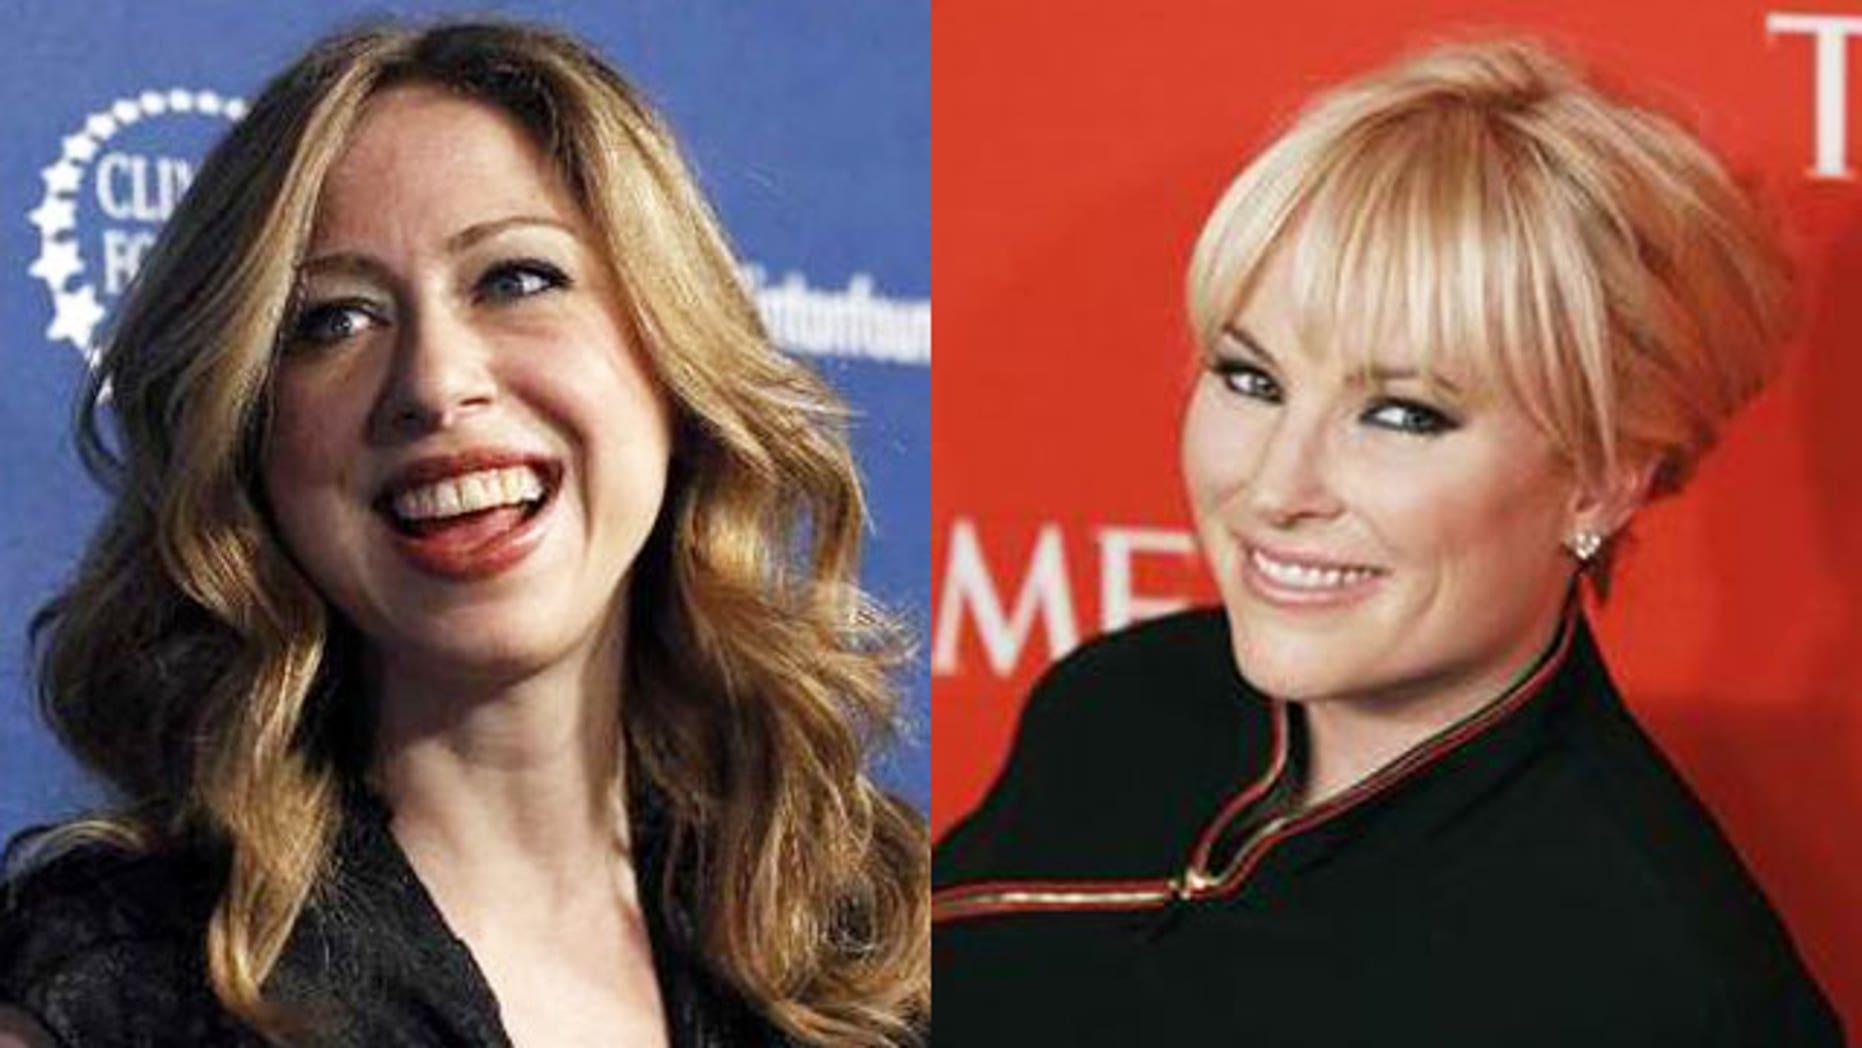 Chelsea Clinton and Meghan McCain both now work for NBC News.